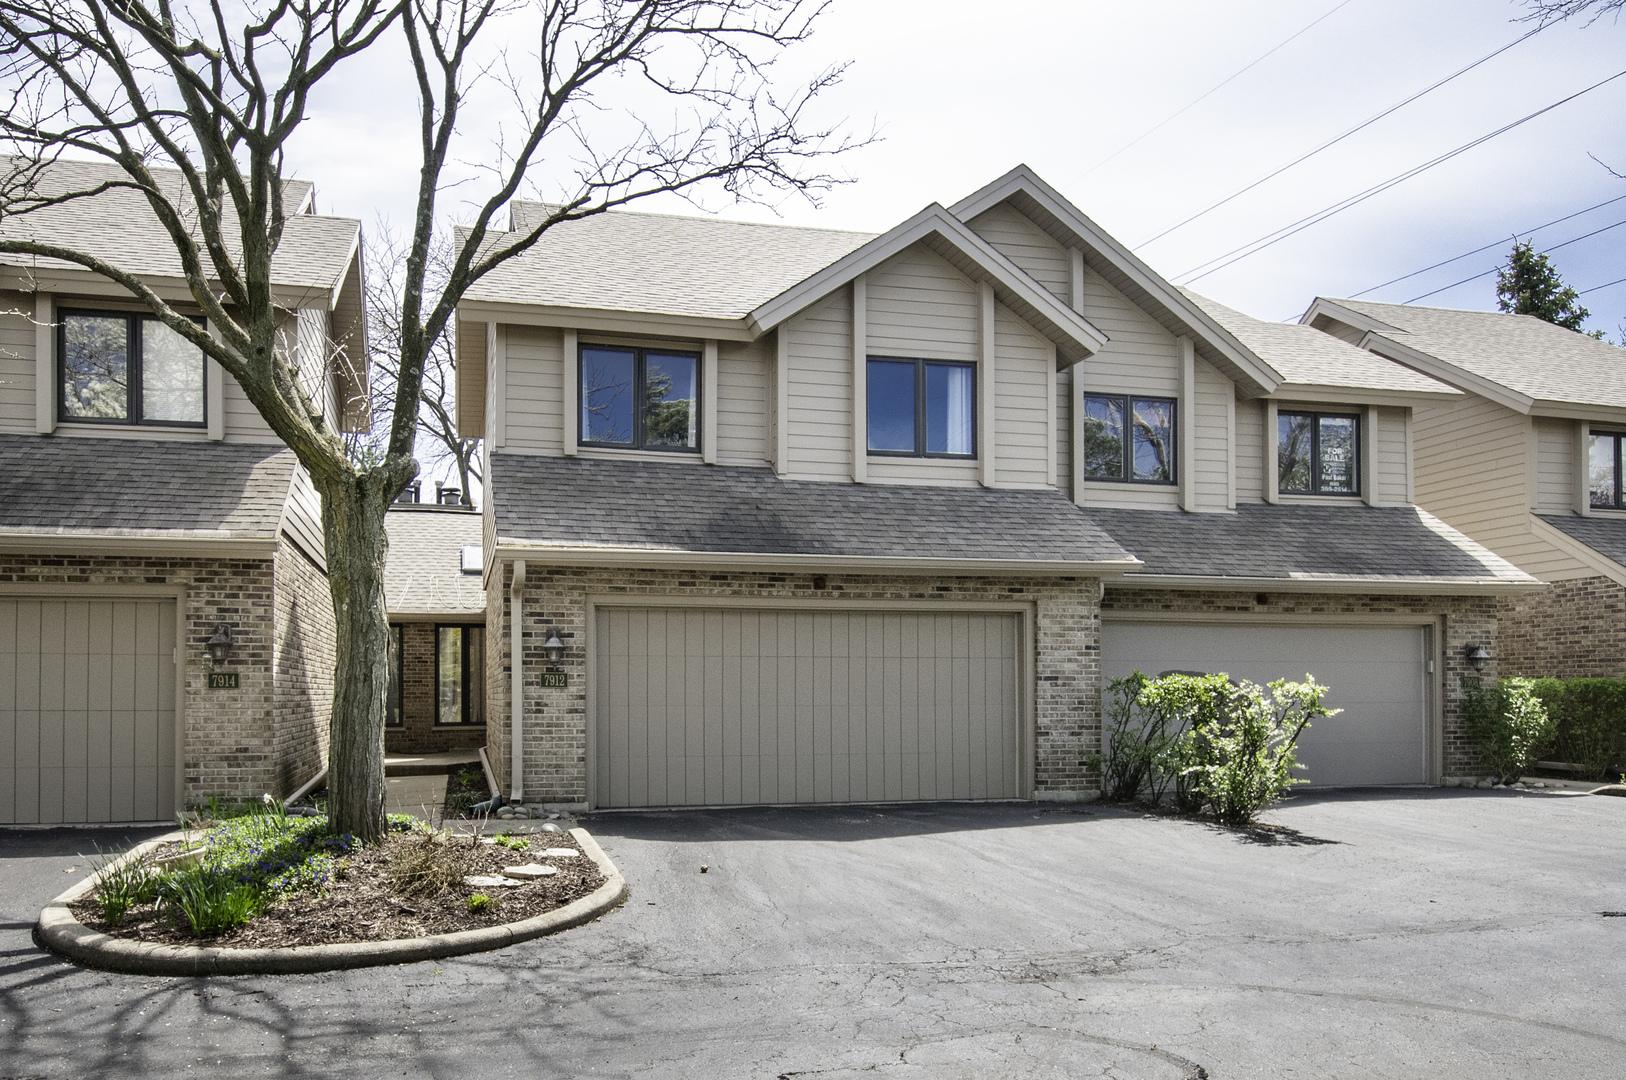 7912 South Garfield Avenue, Burr Ridge, Illinois